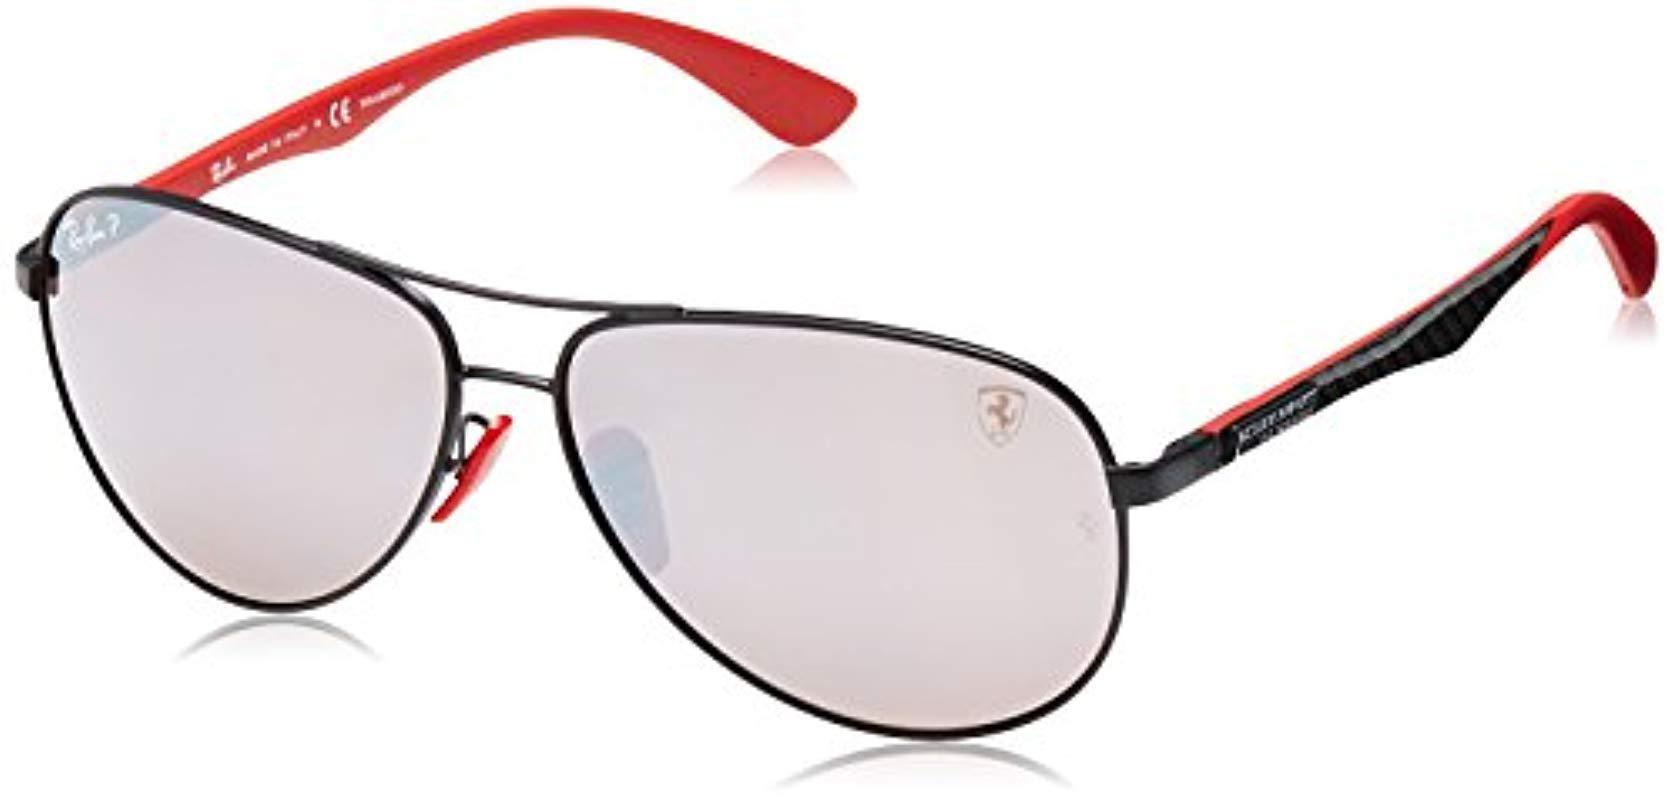 37ddd62a13 ... hot ray ban. mens black rb8313m scuderia ferrari collection polarized  sunglasses cc1a2 14176